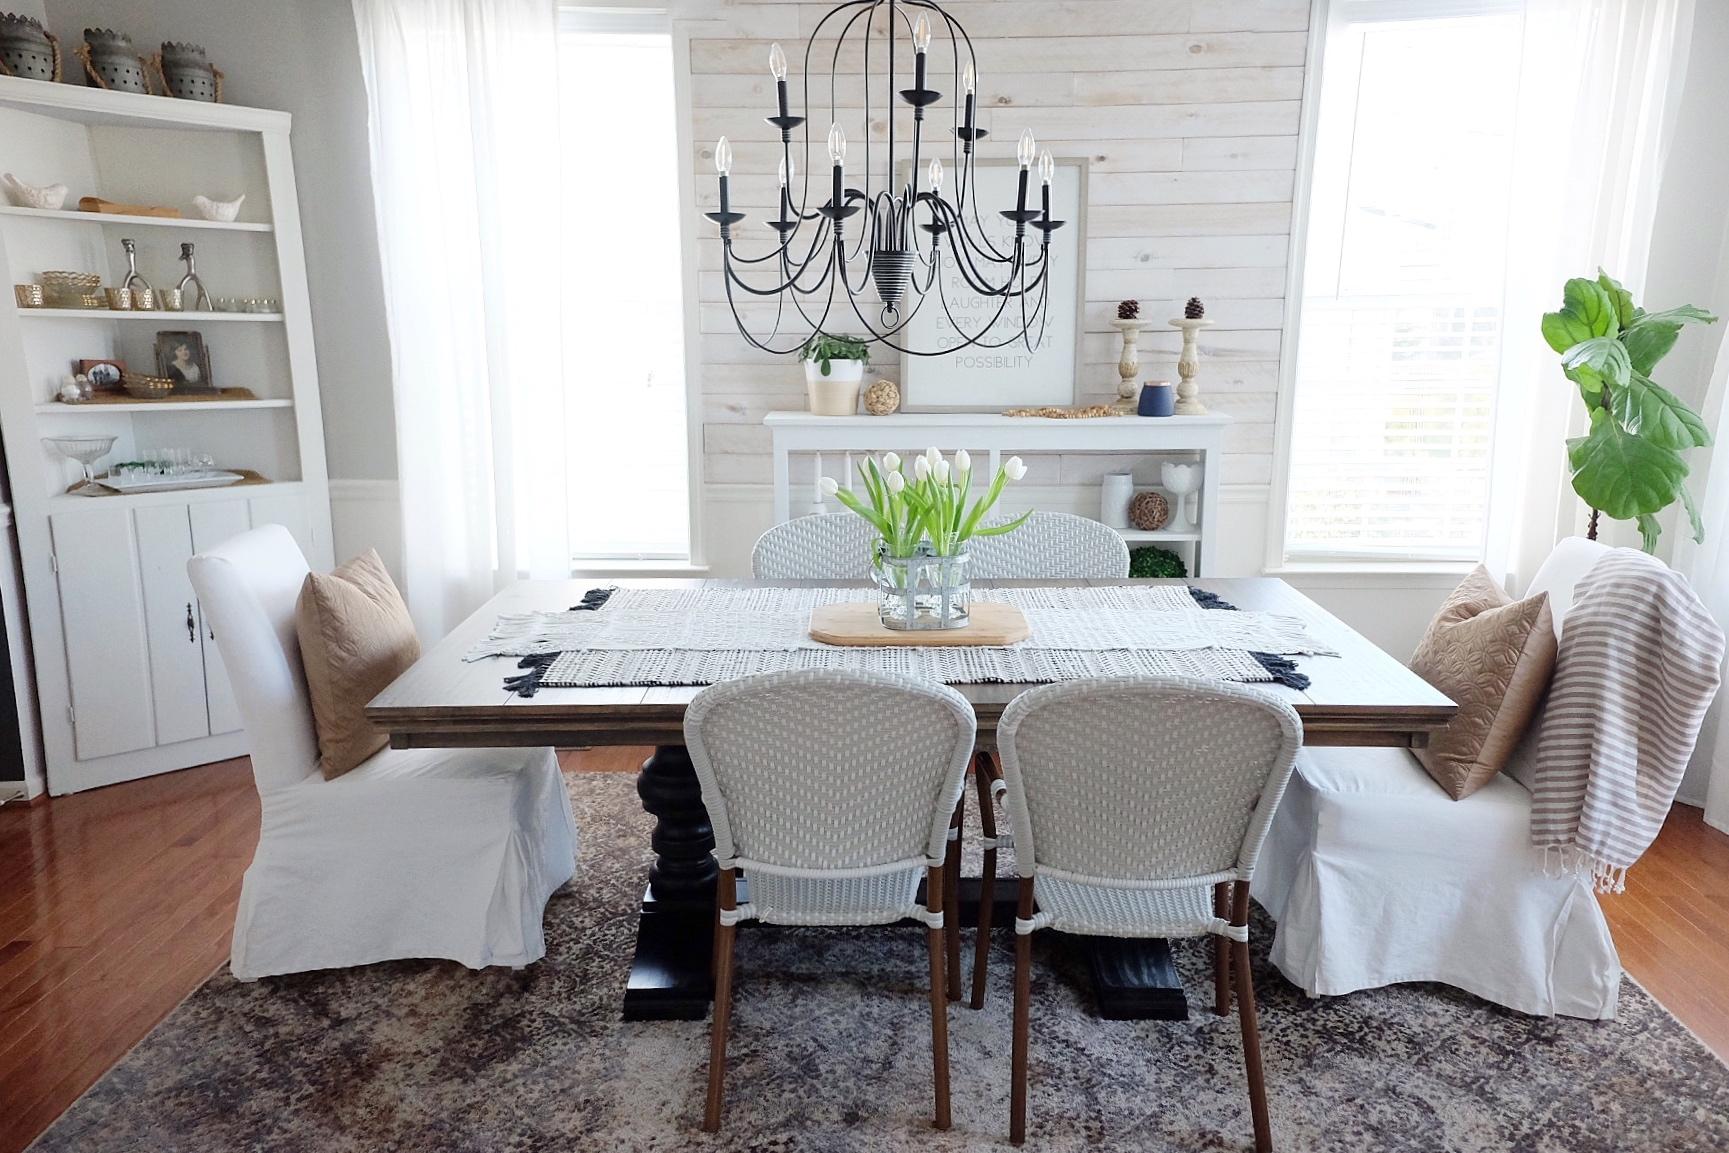 White Slipcovered chairs   White/Wood Chairs   black light